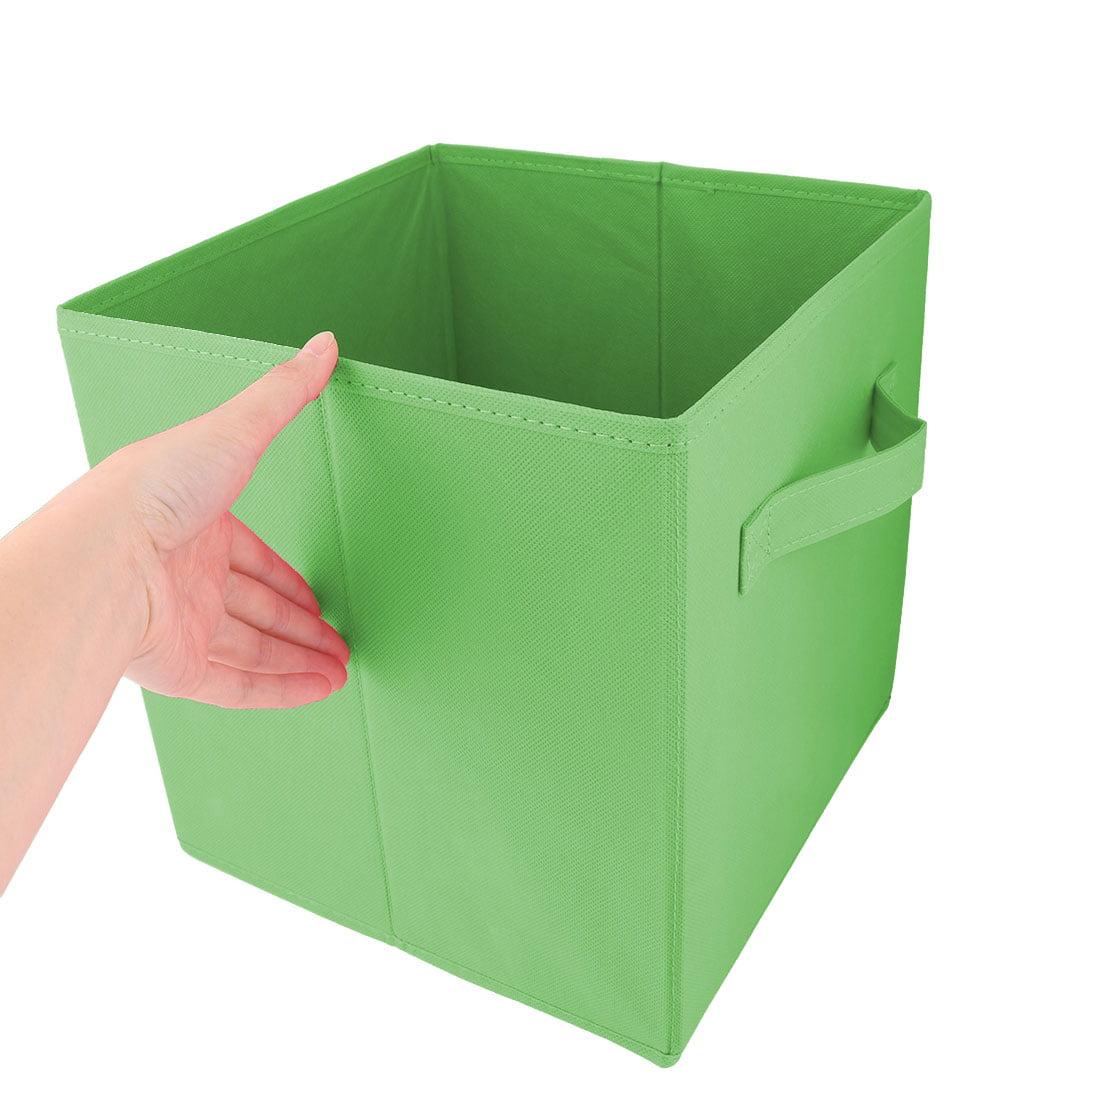 Apartment Non-woven Fabric Foldable Books Cosmetics Holder Storage Box Green - image 1 of 5